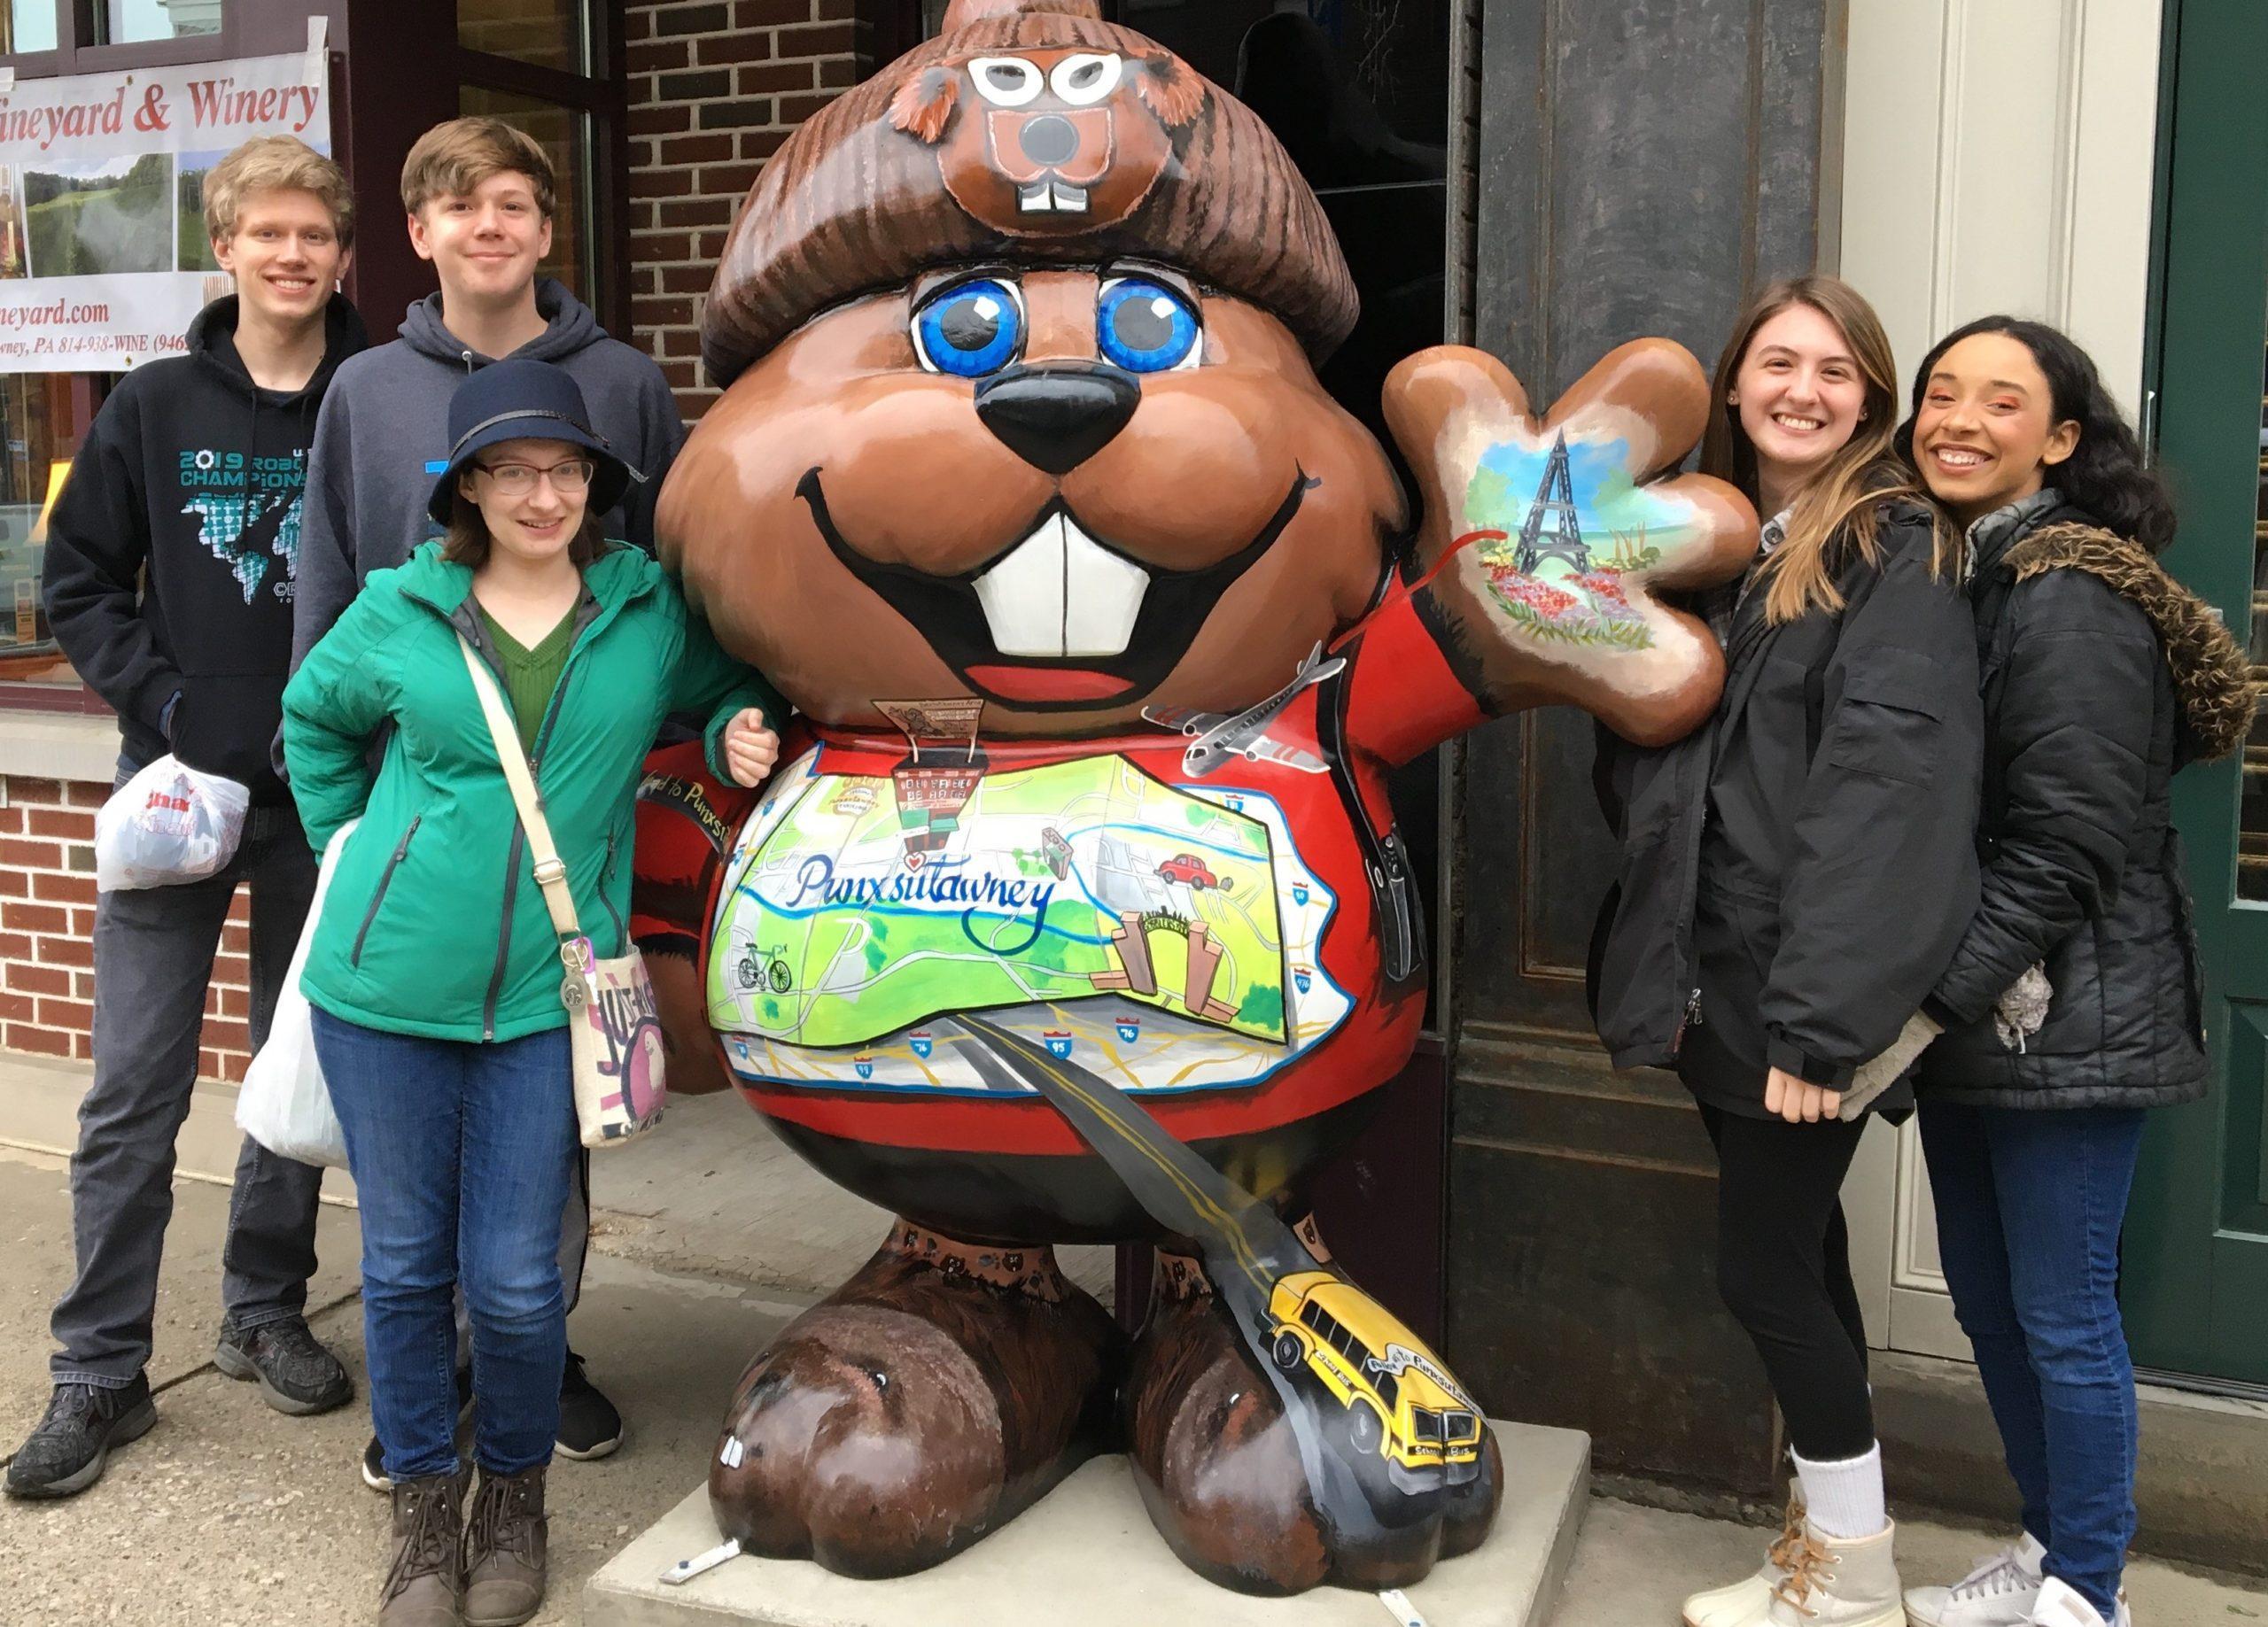 Downingtown Teens Spend Groundhog Day with Punxsutawney Phil